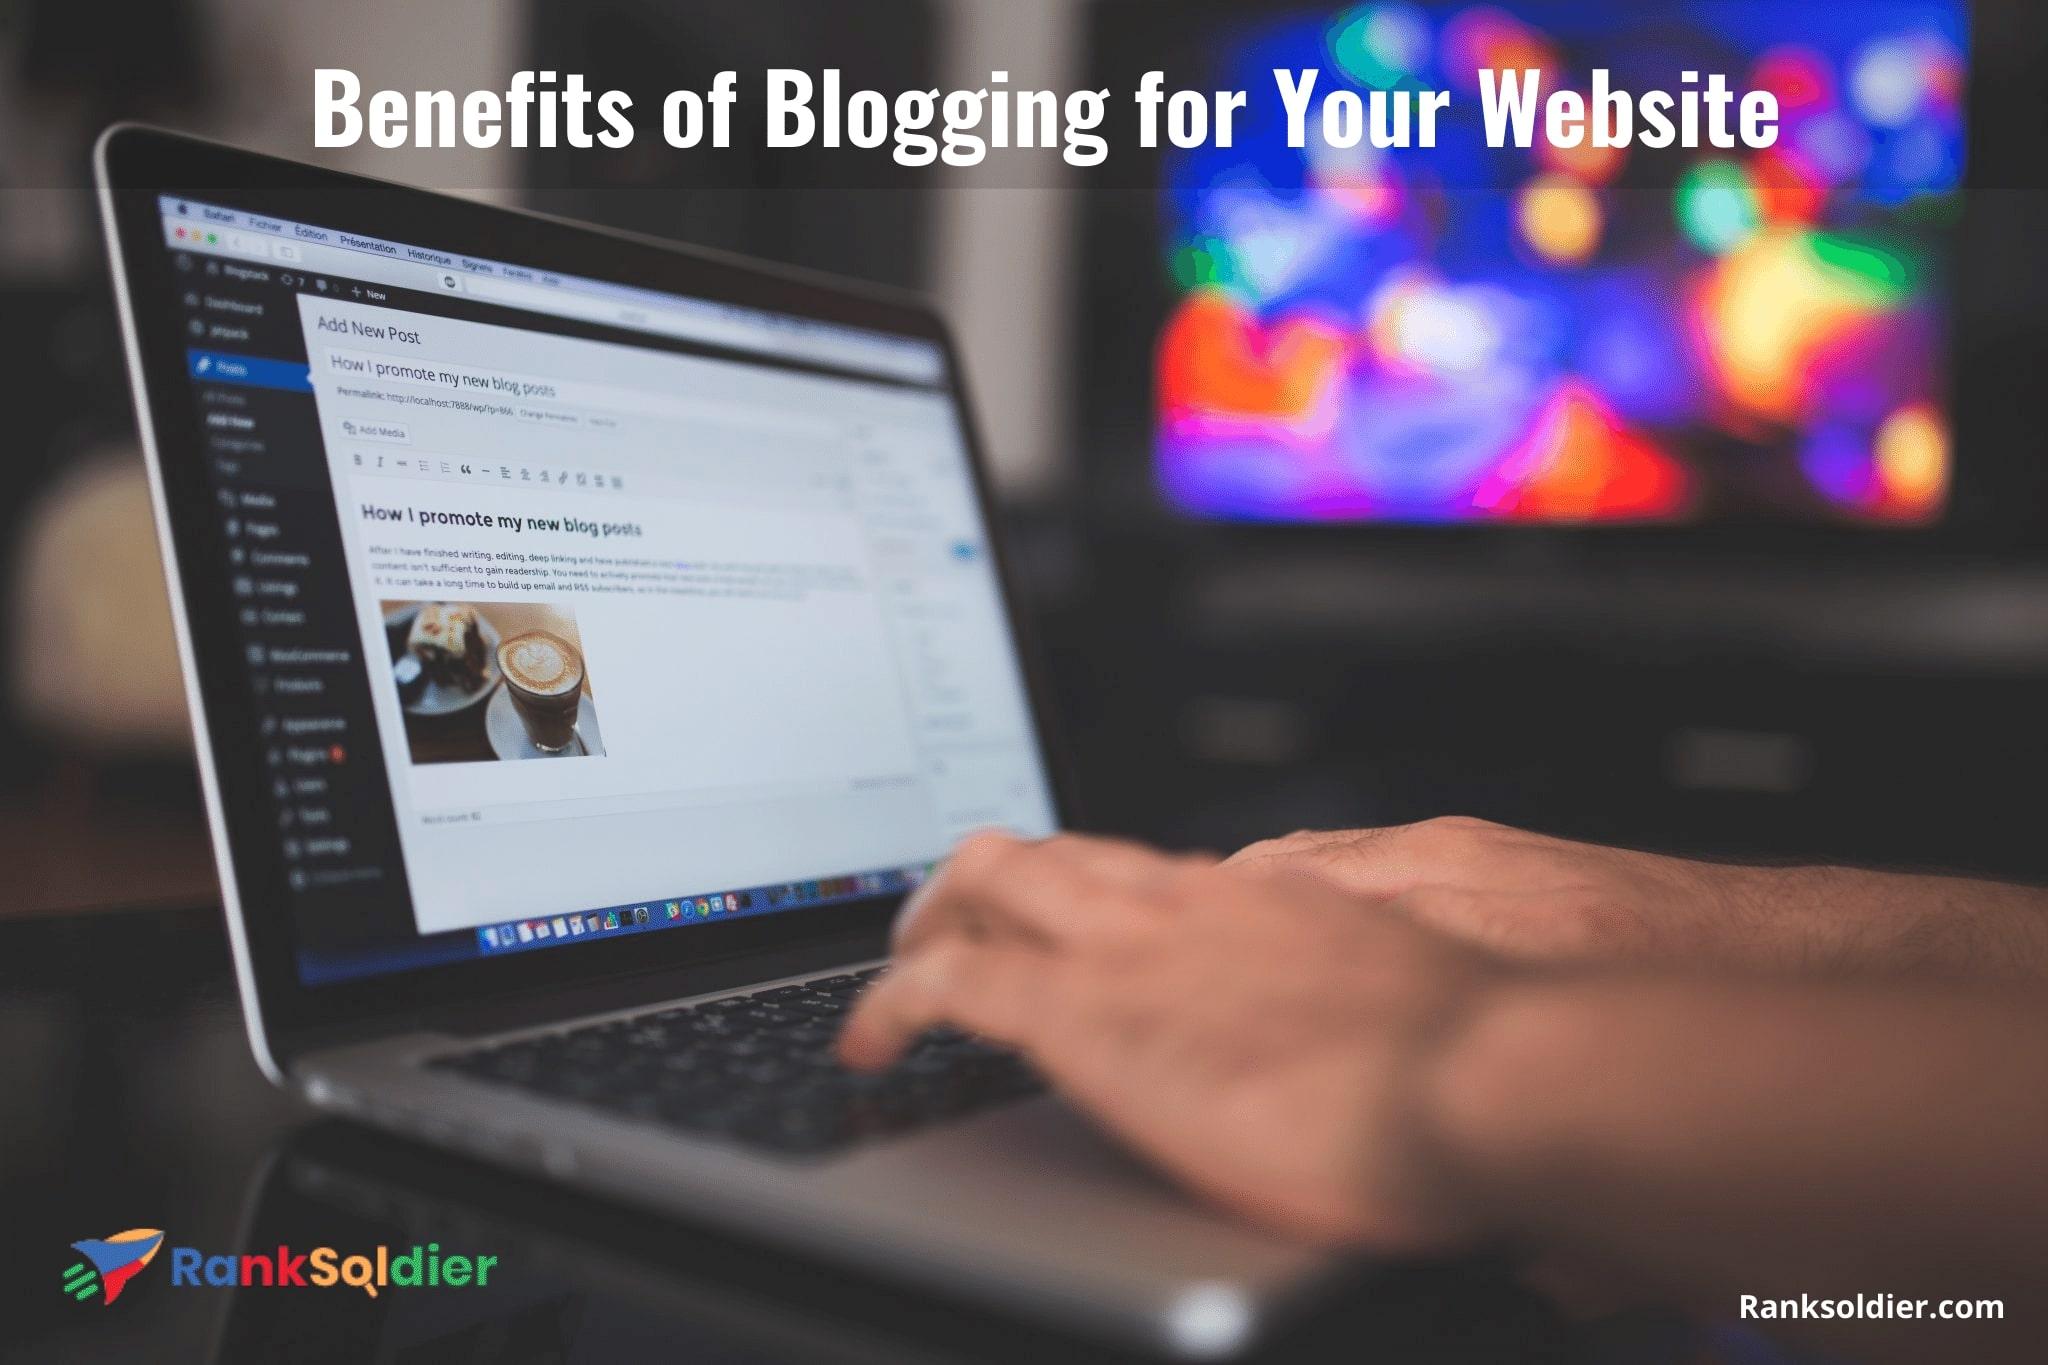 Benefits of Blogging for Your Website